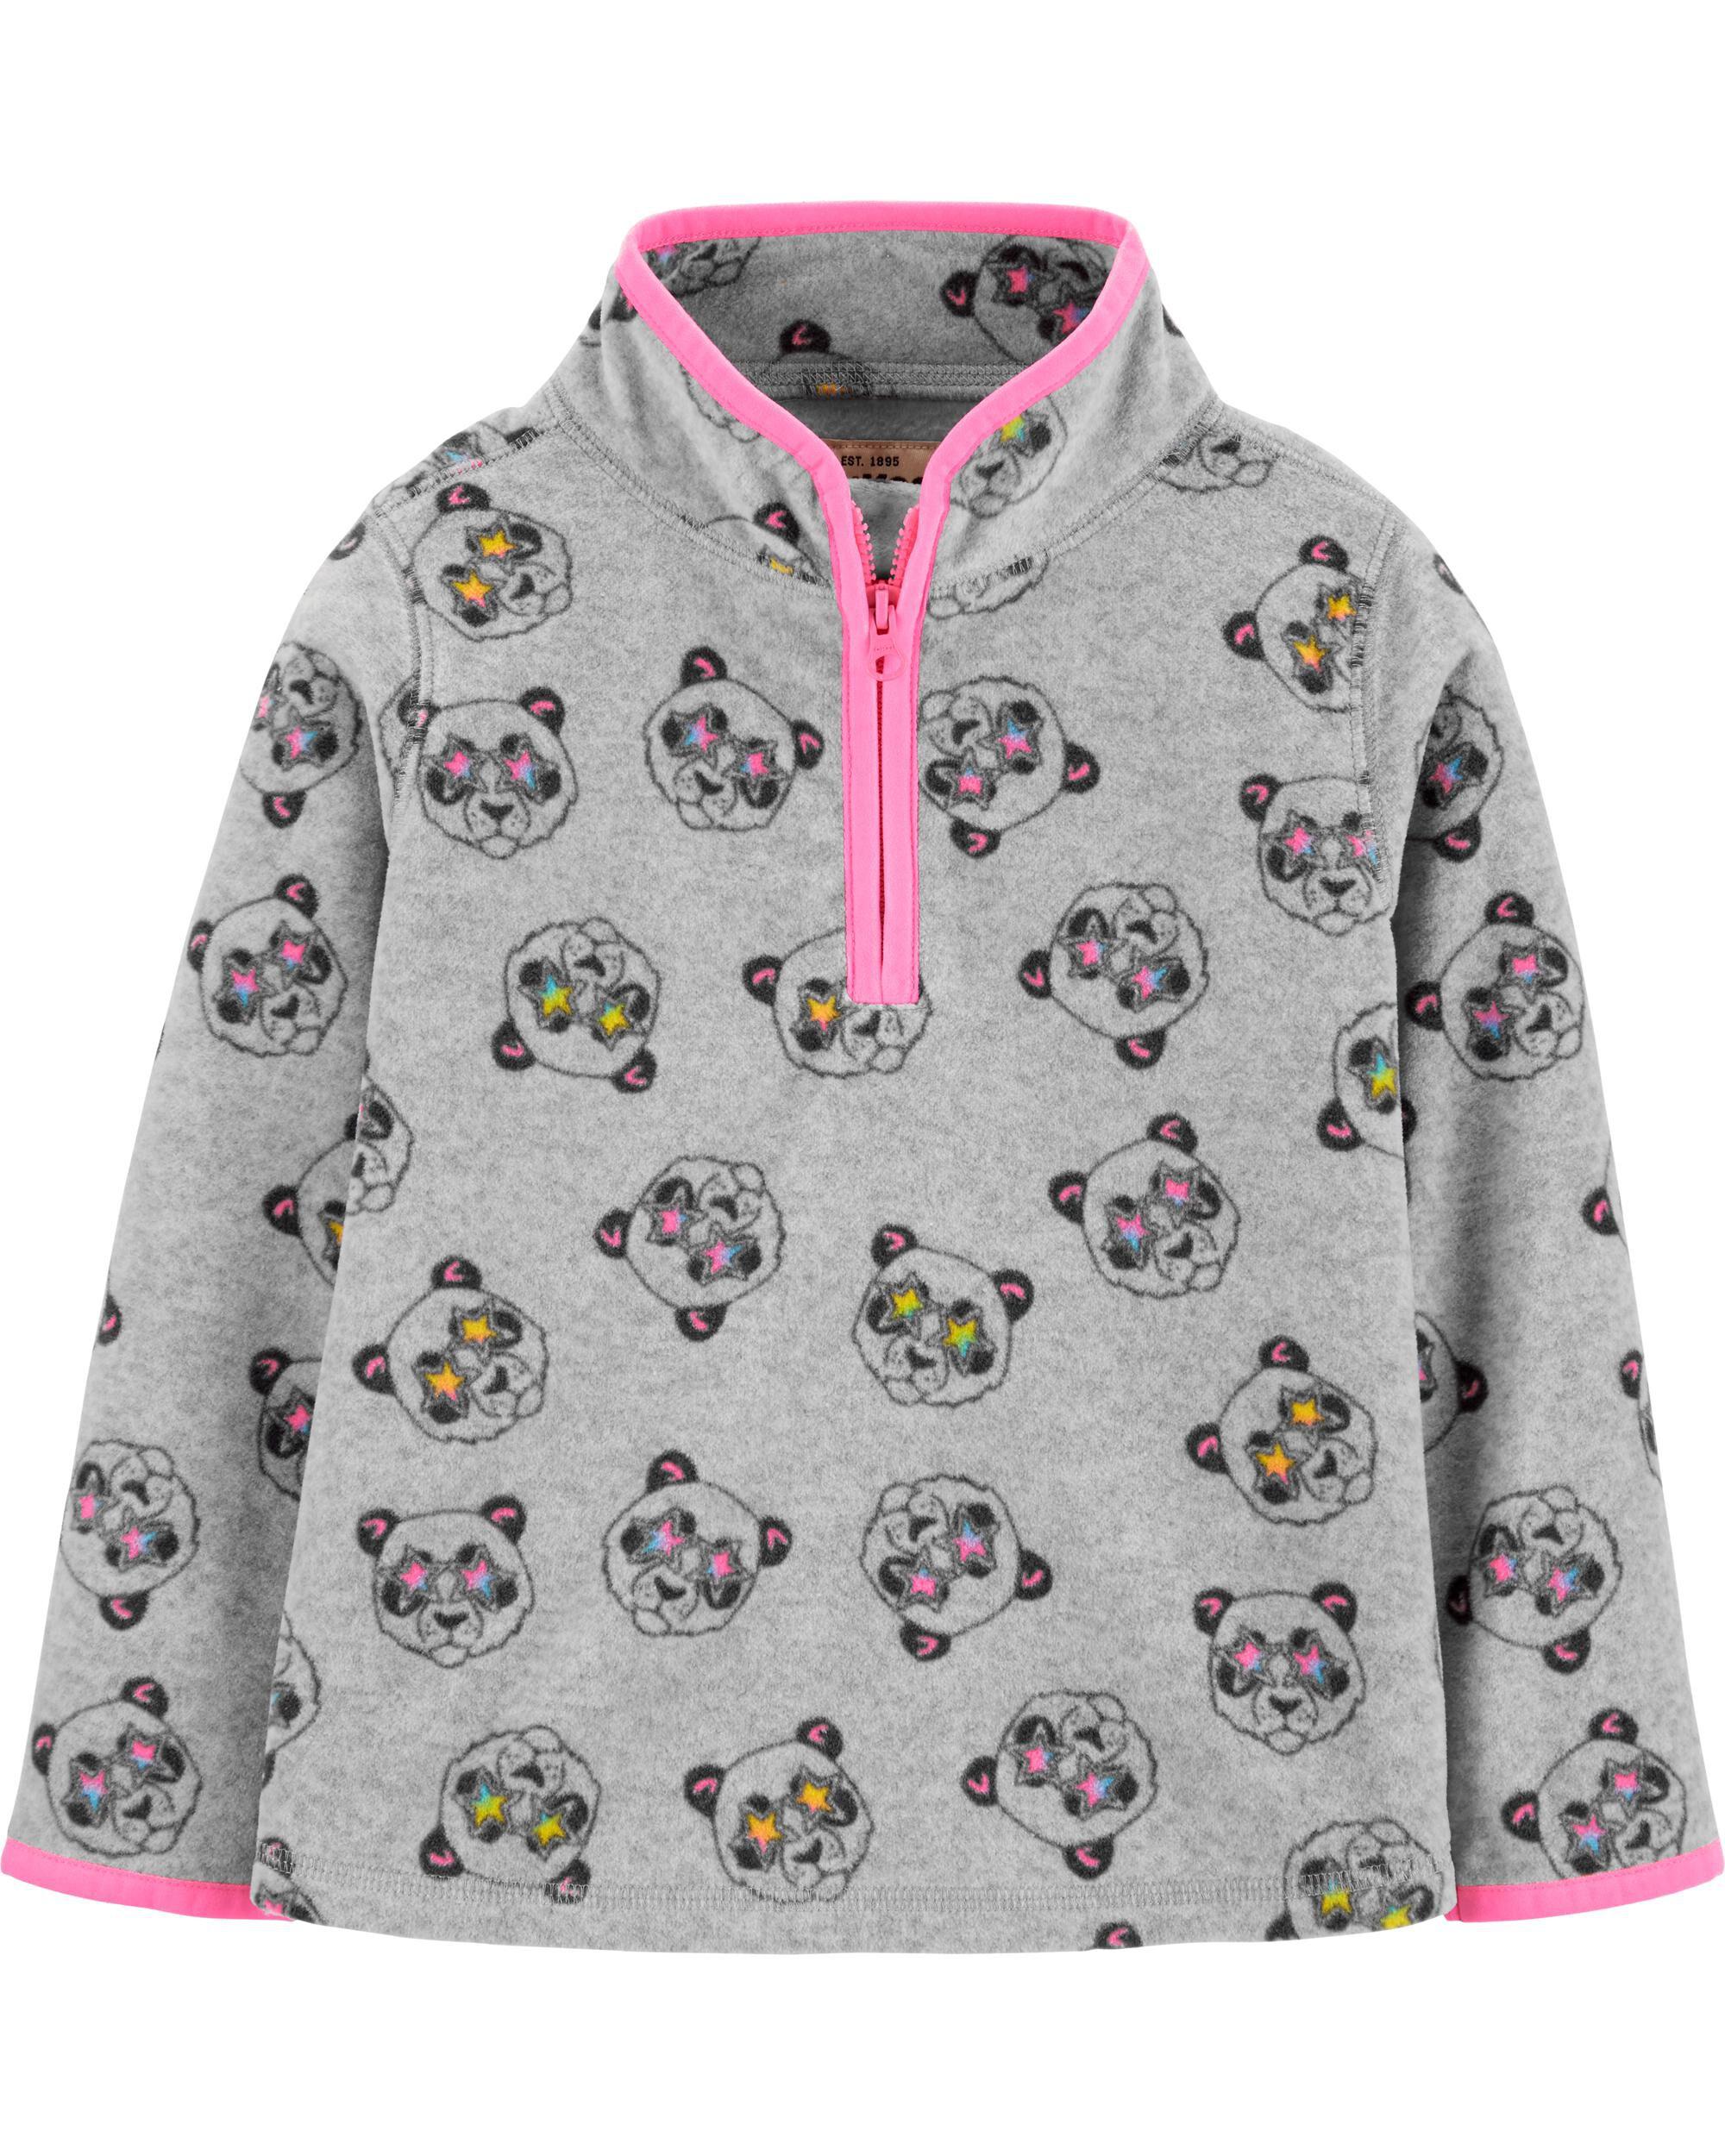 *CLEARANCE* Panda B'gosh Fleece Cozie